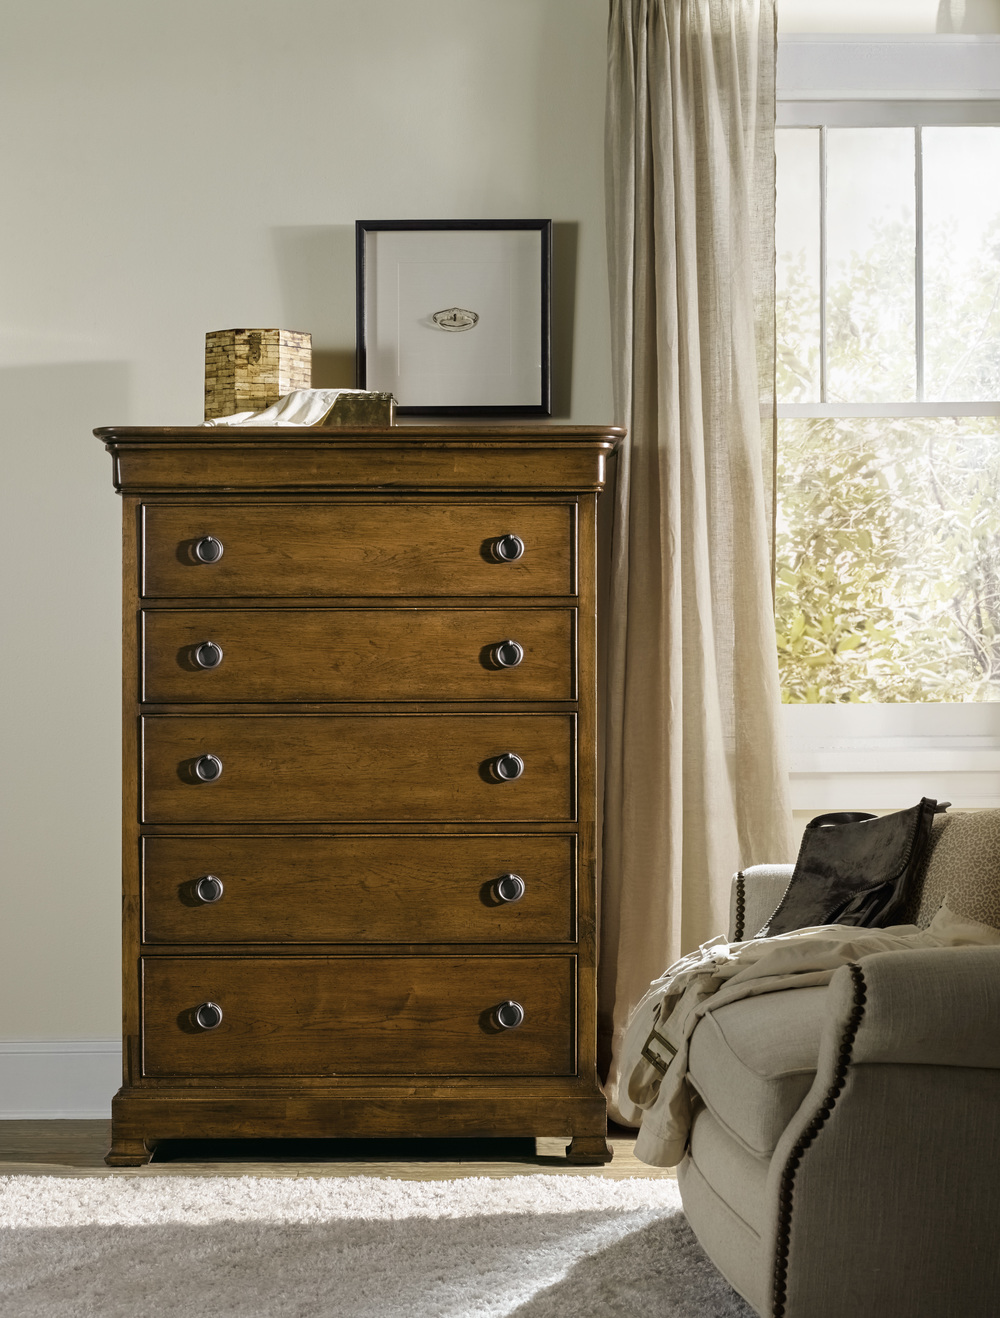 Hooker Furniture - Archivist Six Drawer Chest